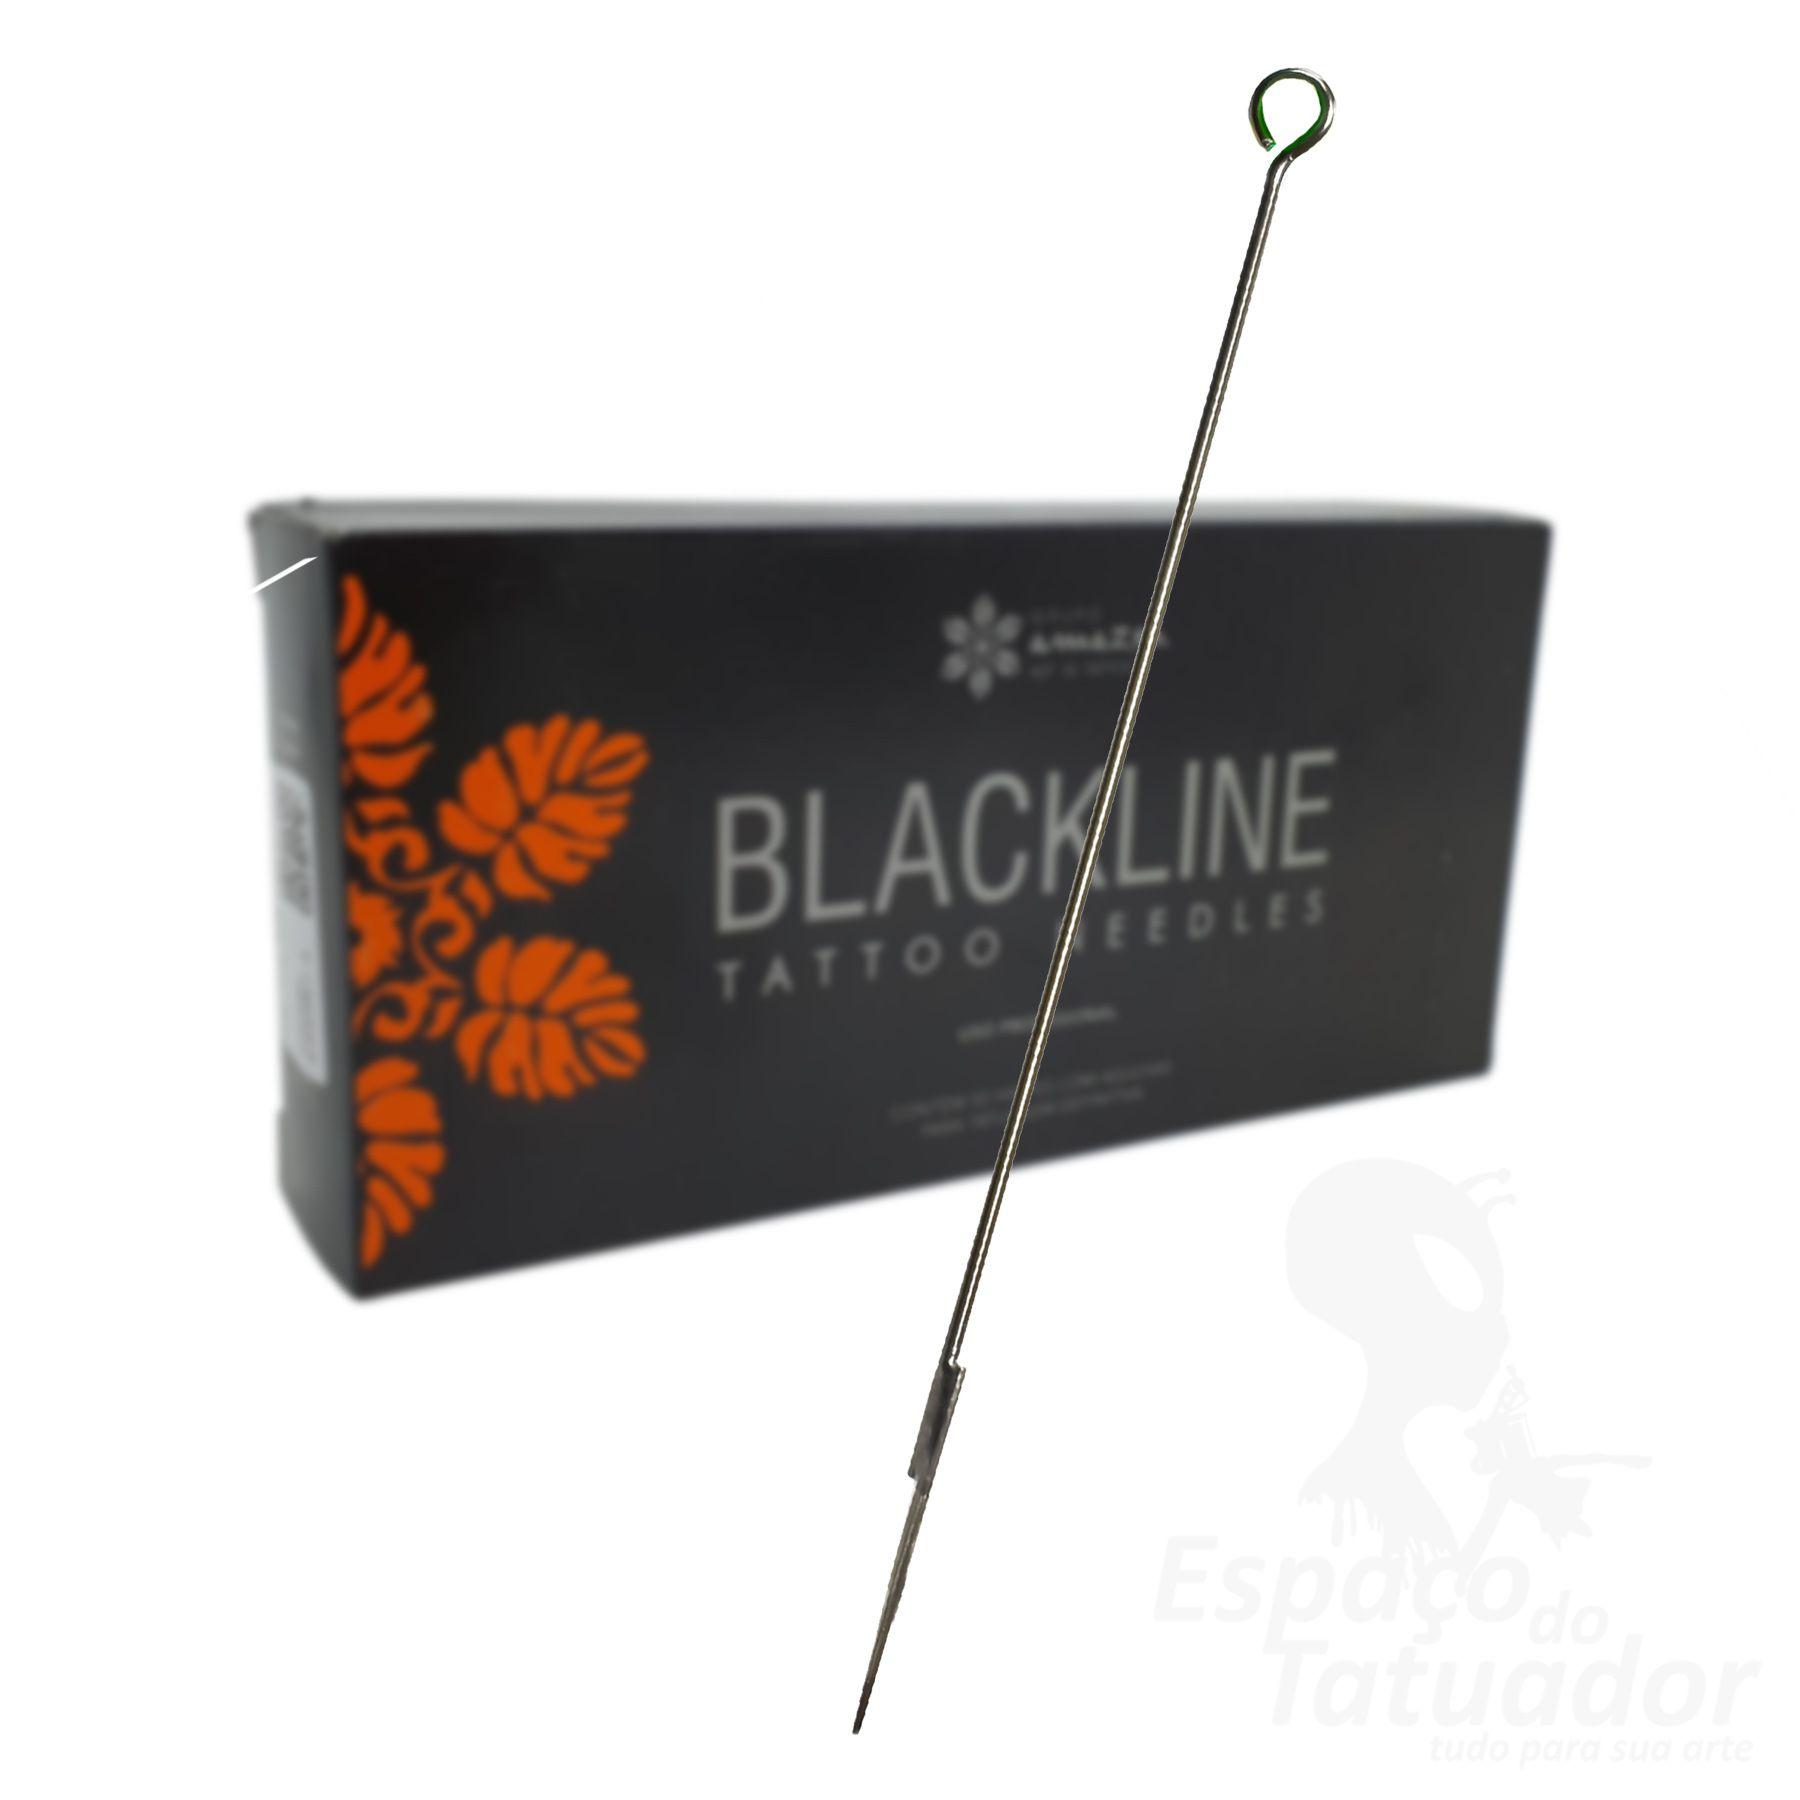 Agulha Black Line - RL 1209 - Unidade